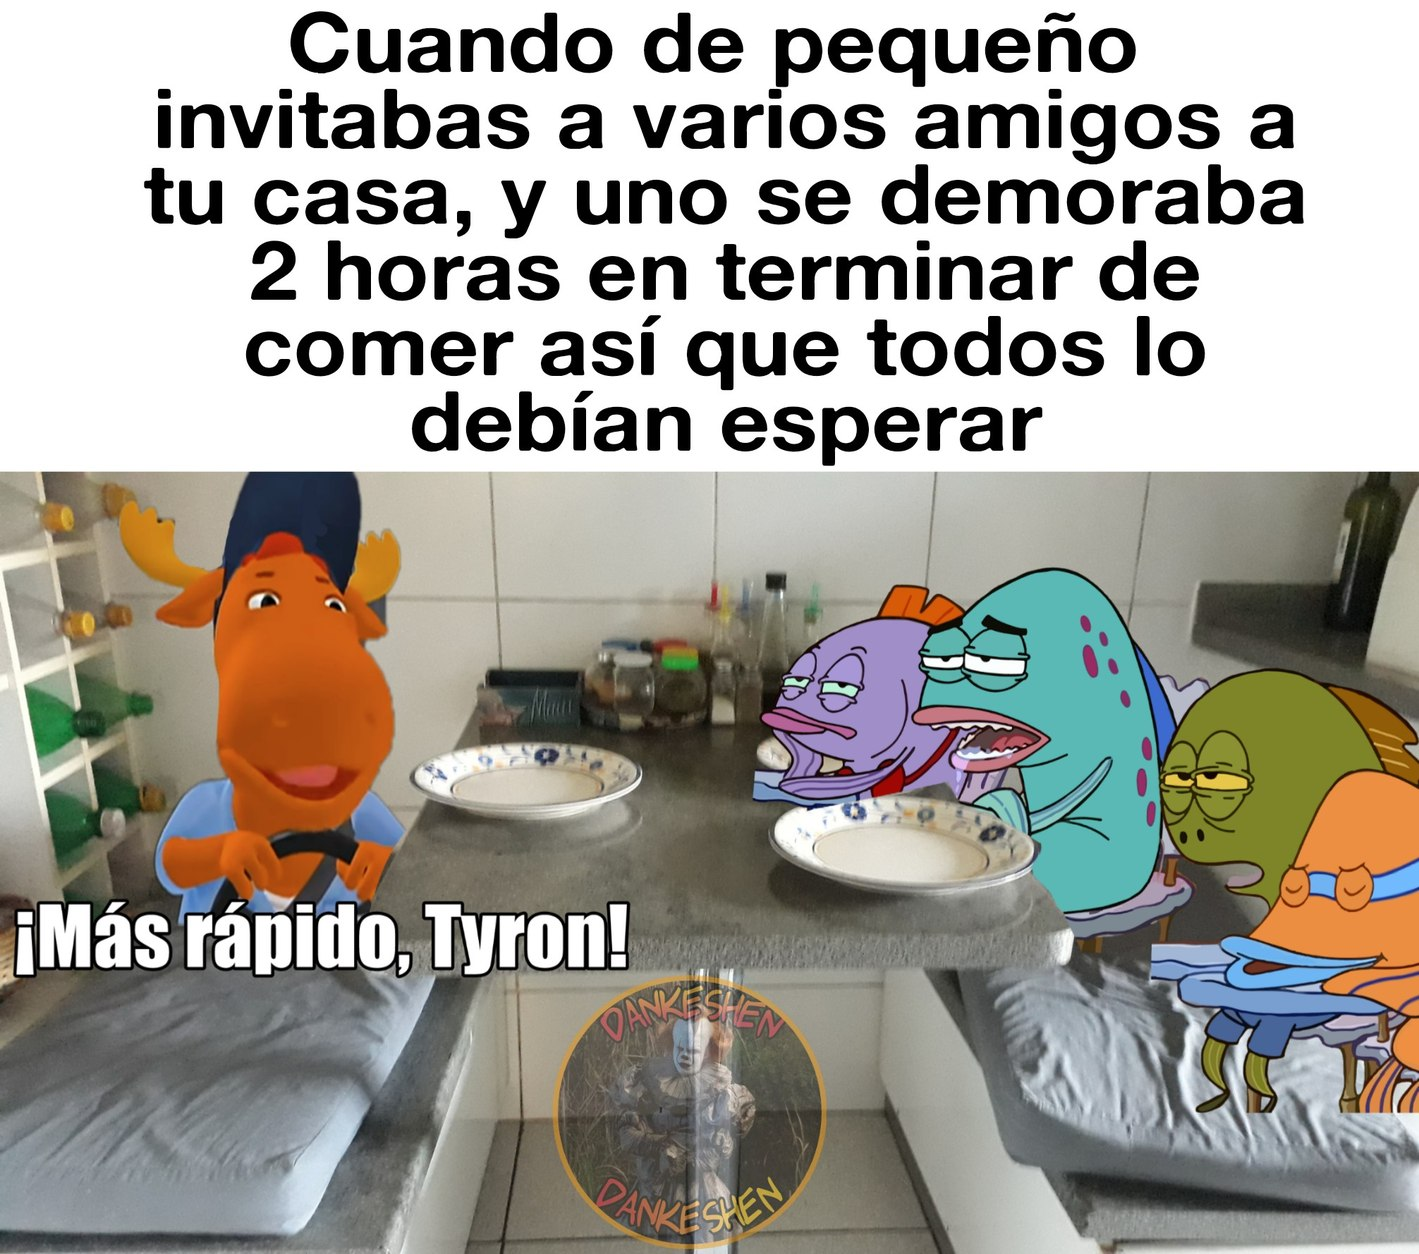 Tyron qliao - meme